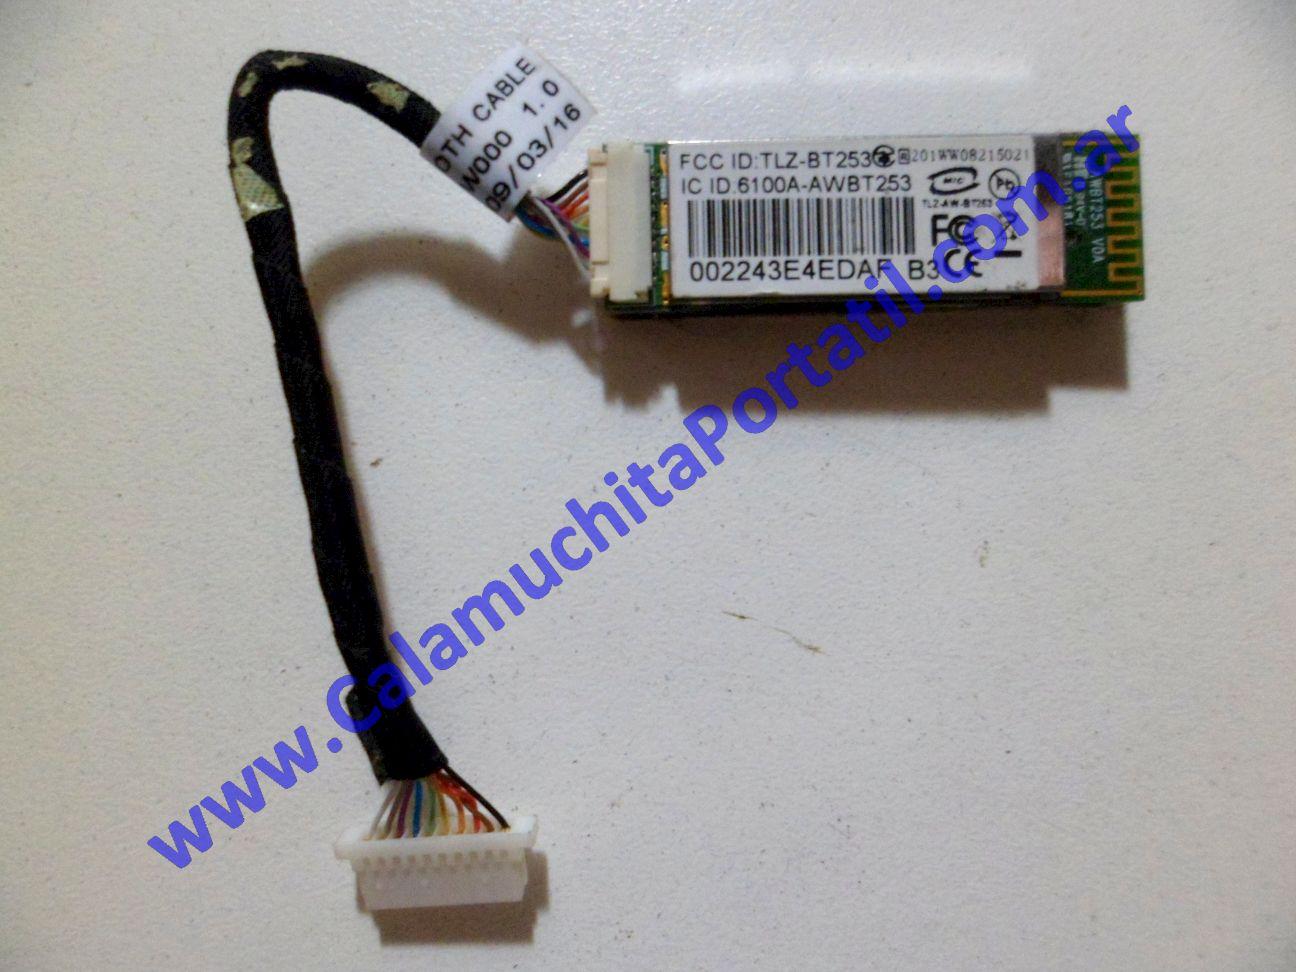 0076PBL Placa Bluetooth Asus Eee PC 1000HE